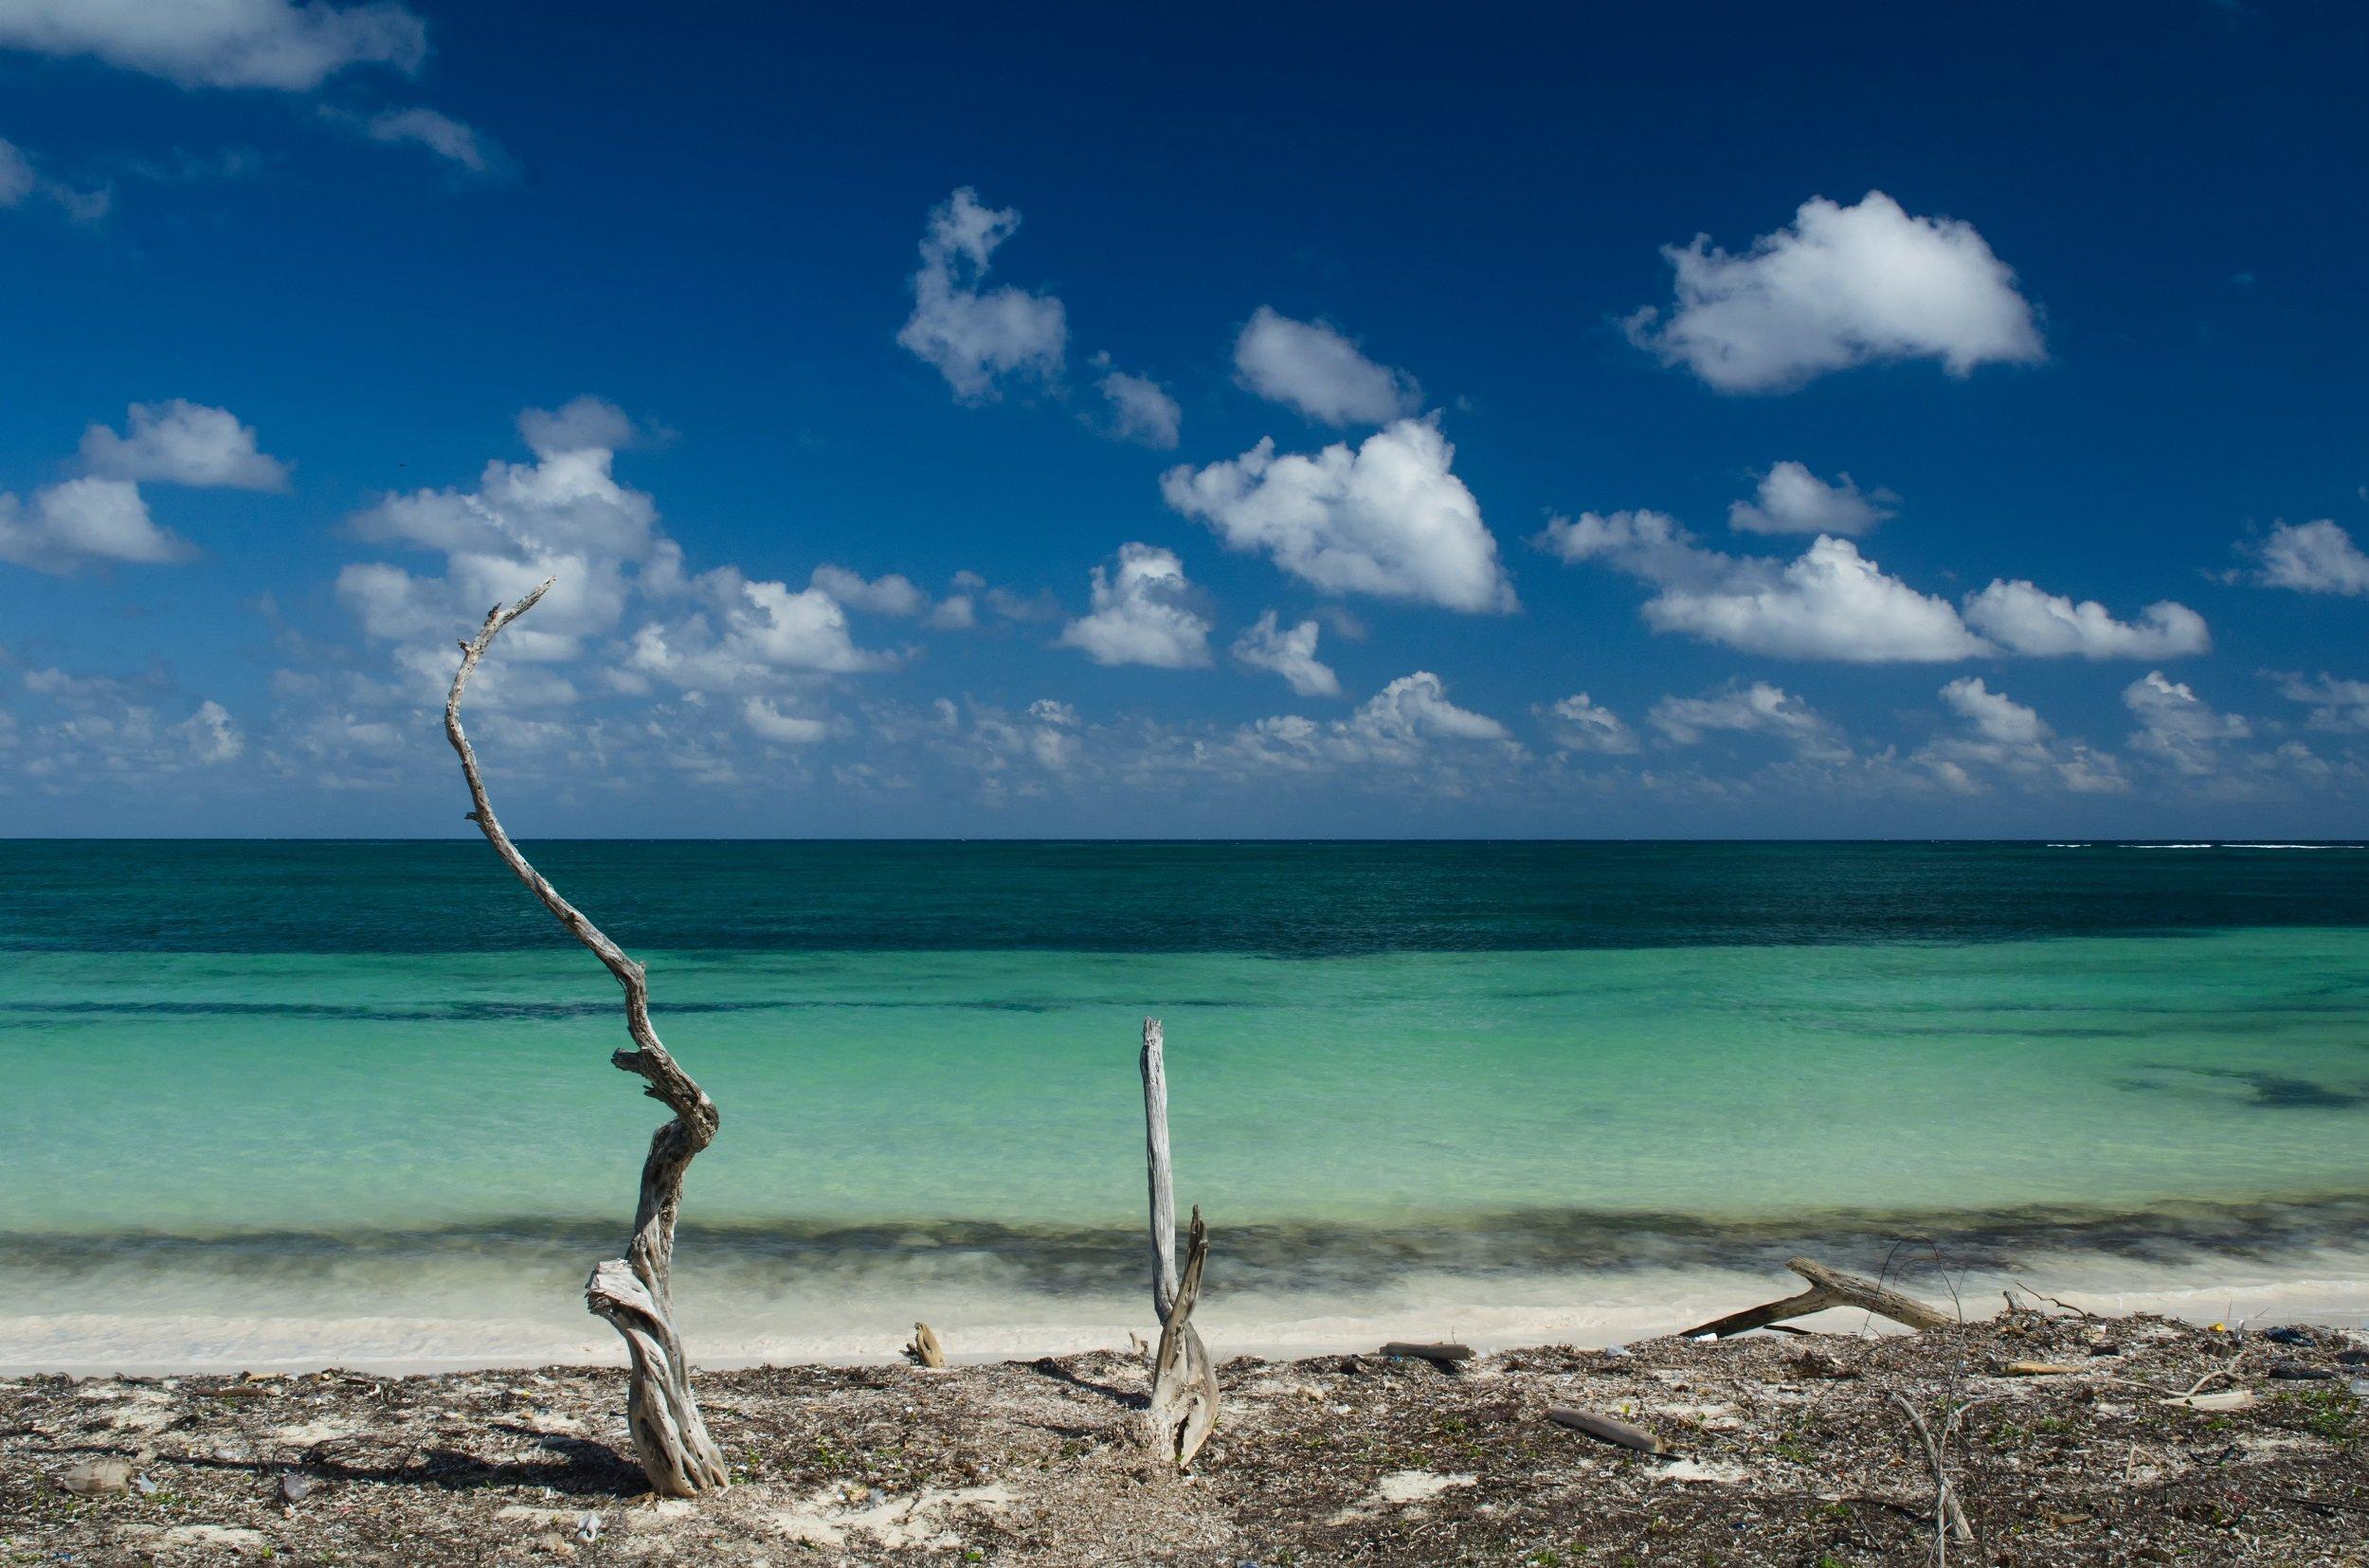 Sian Ka'an Eco Adventure Tour From The Riviera Maya